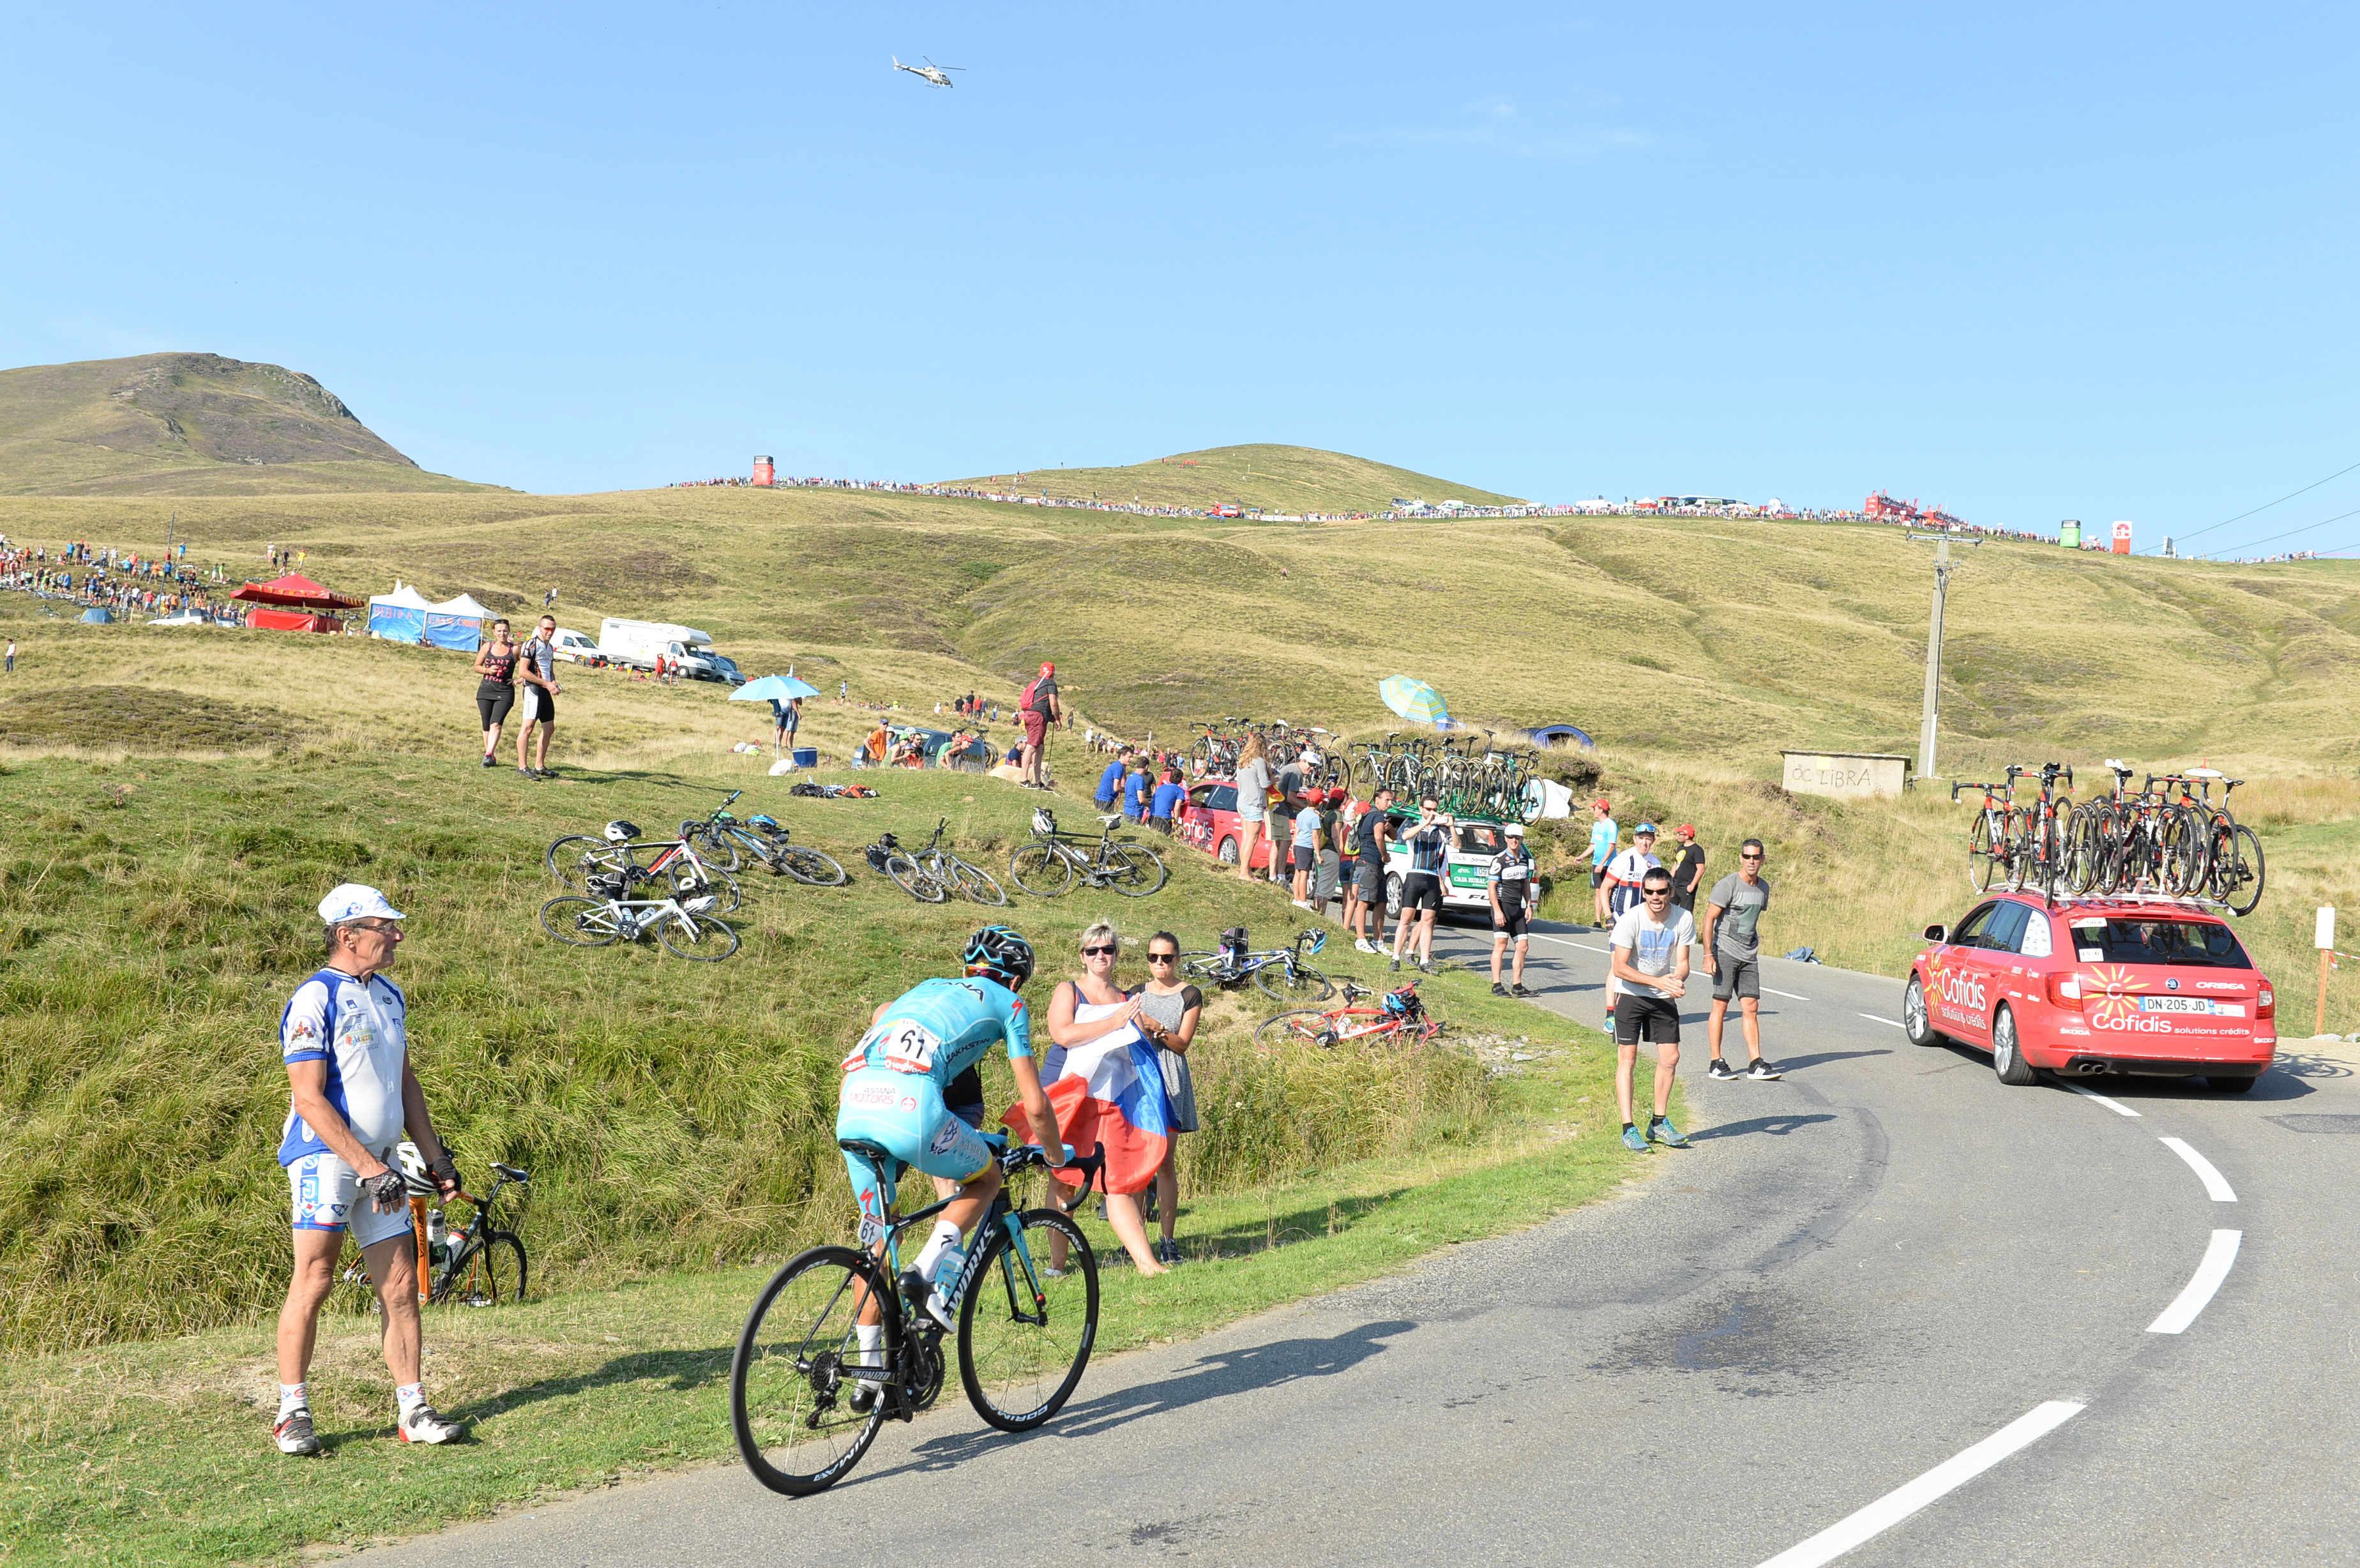 Tour: Zadnji spust zadnje gorske etape zaradi plazu vprašljiv